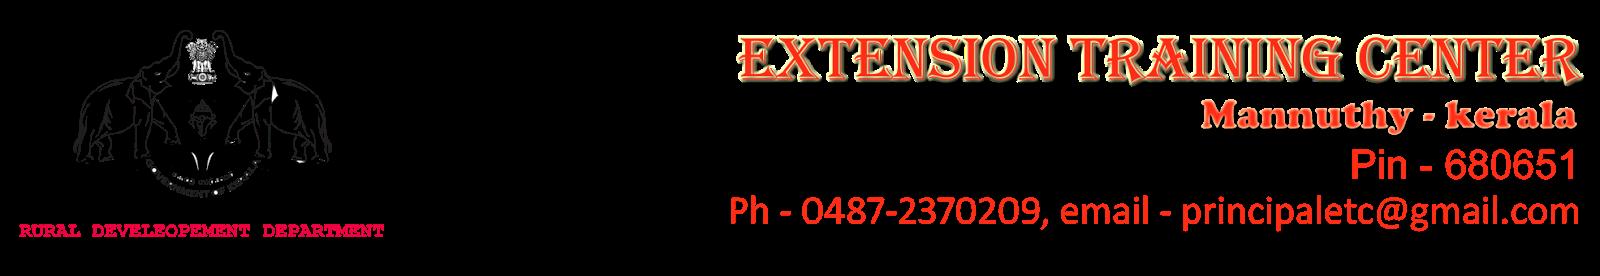 Extension Training Center